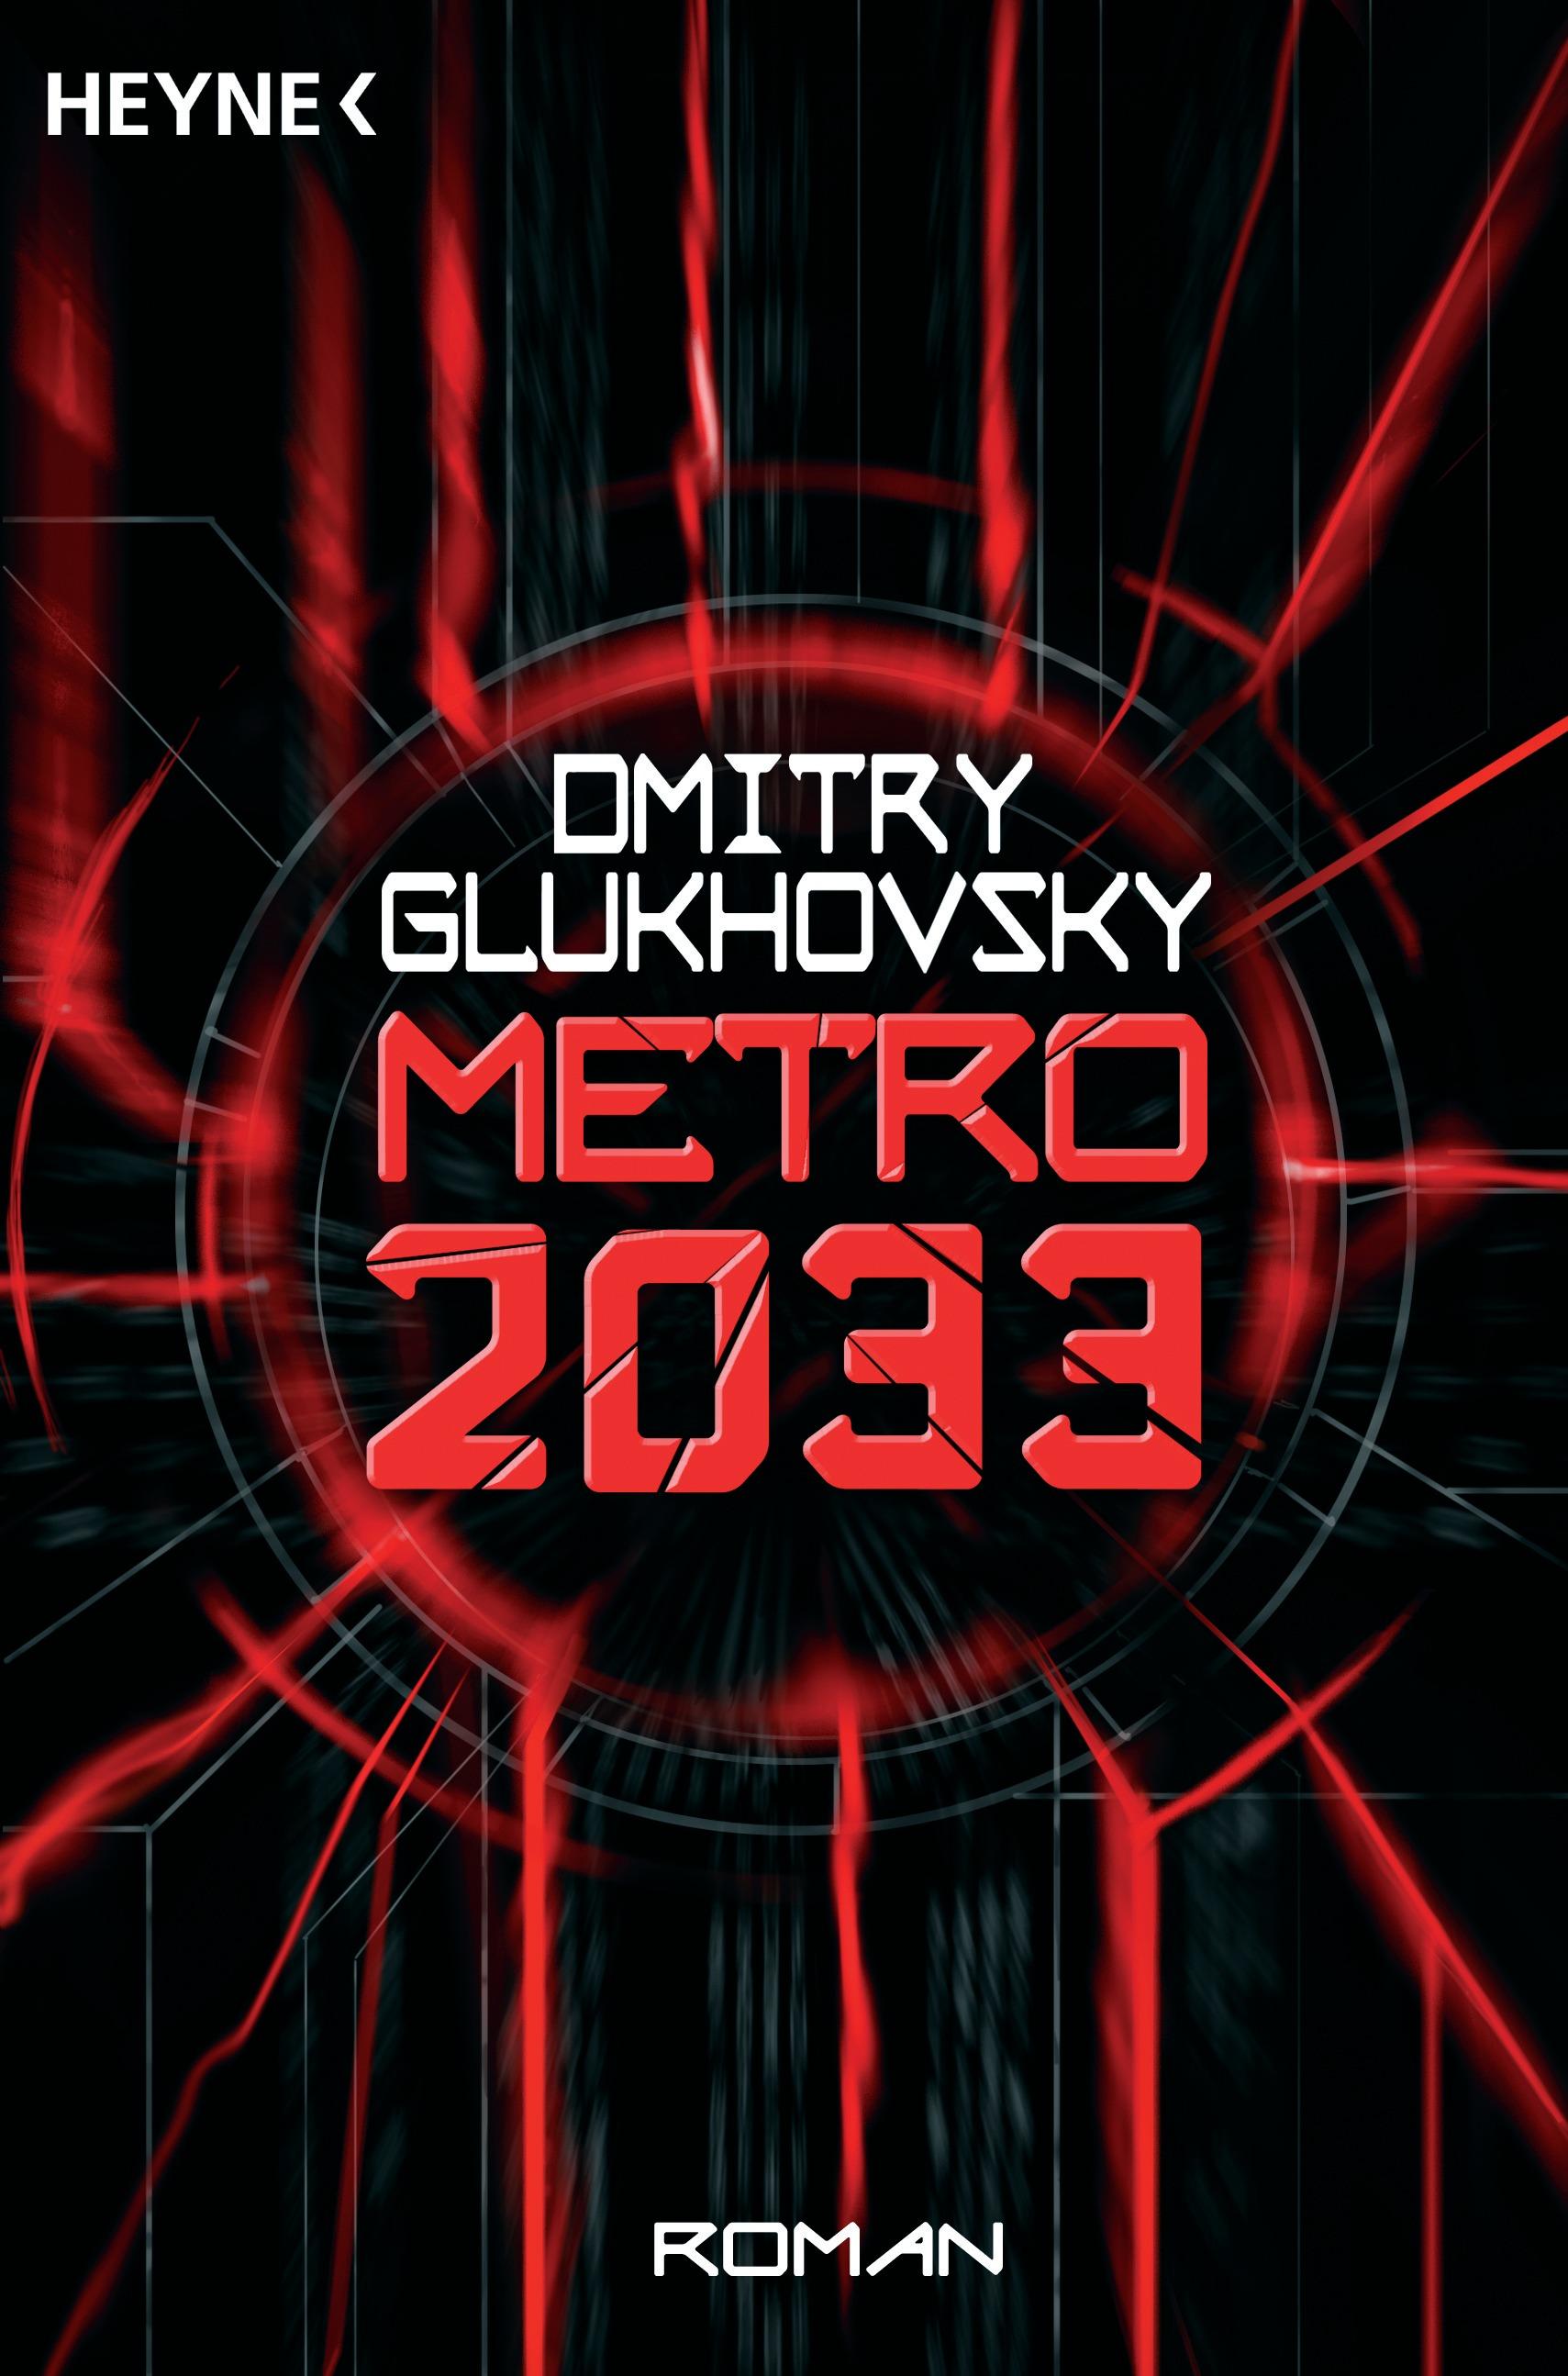 Metro film russian online dating